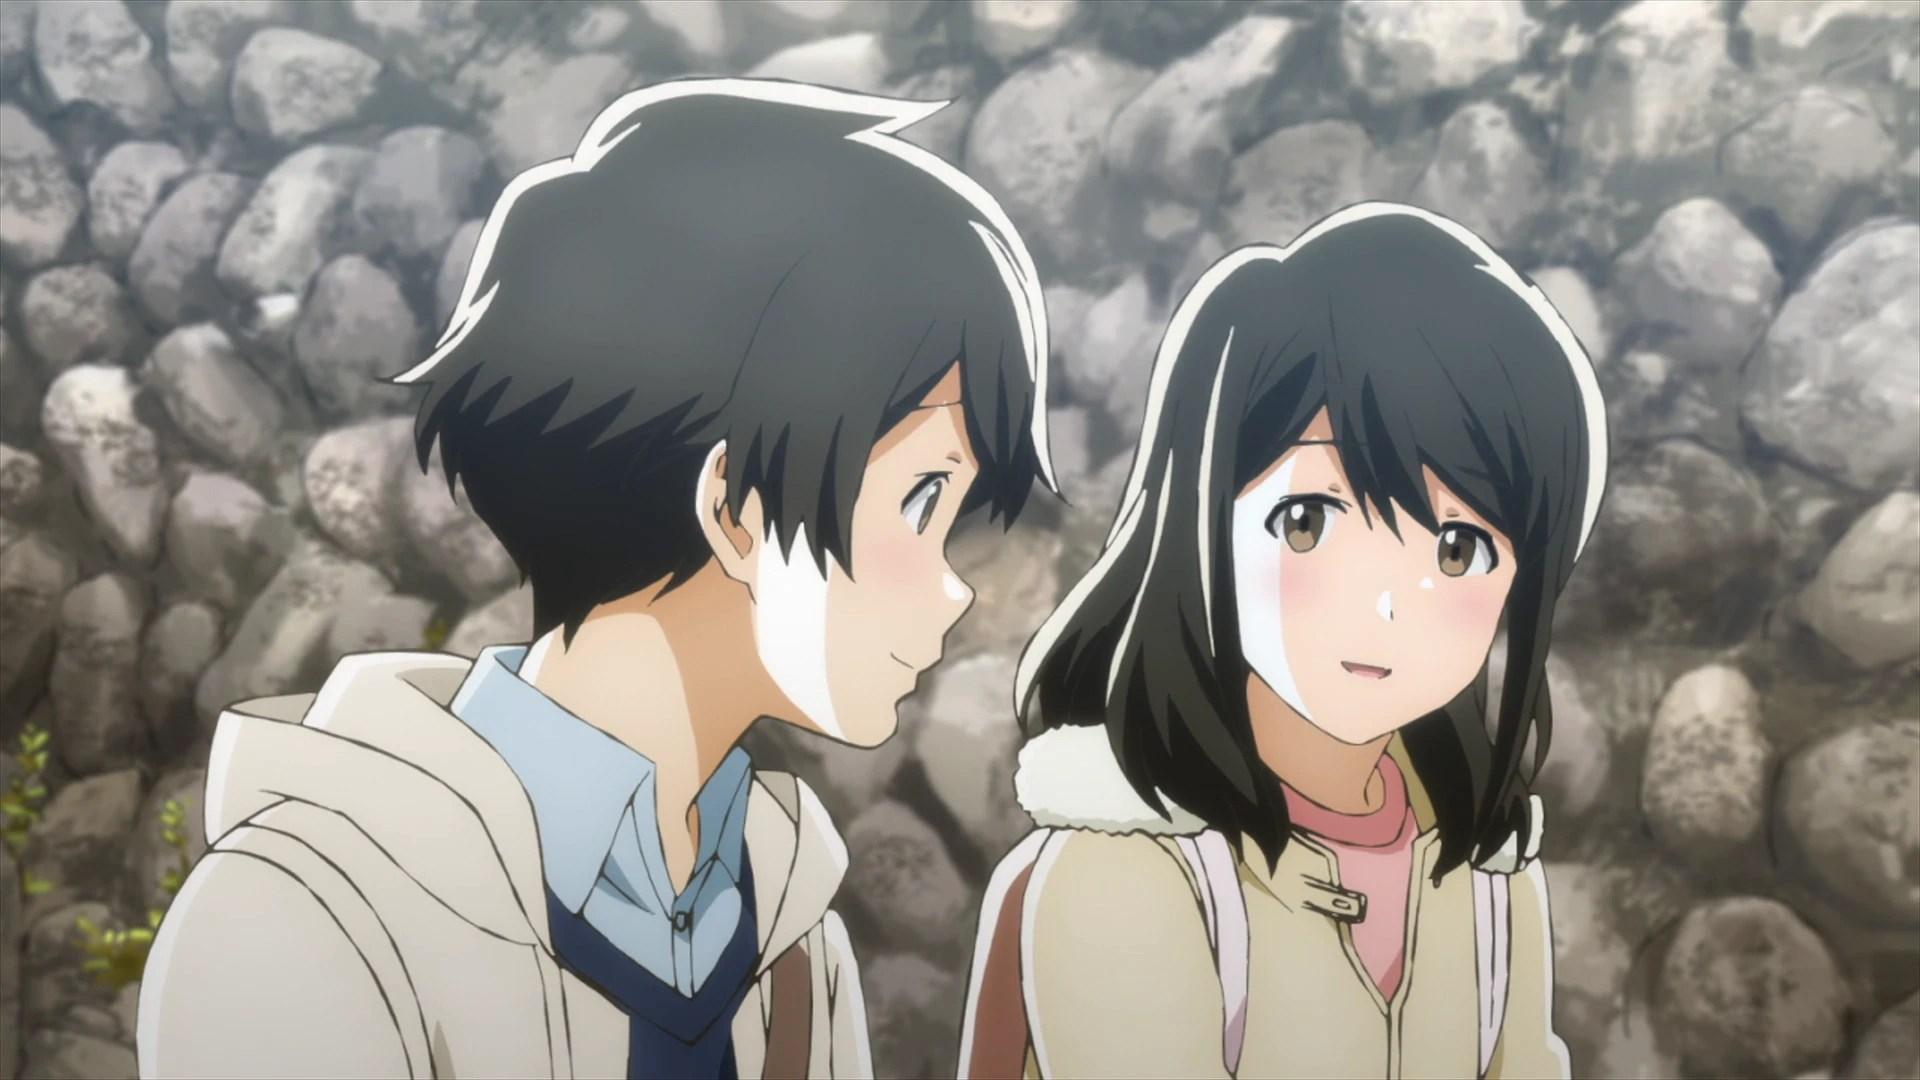 Beautiful Anime Girl Wallpaper Spring 2017 Season Wrap Worldend Girl Beats Boys Amp As